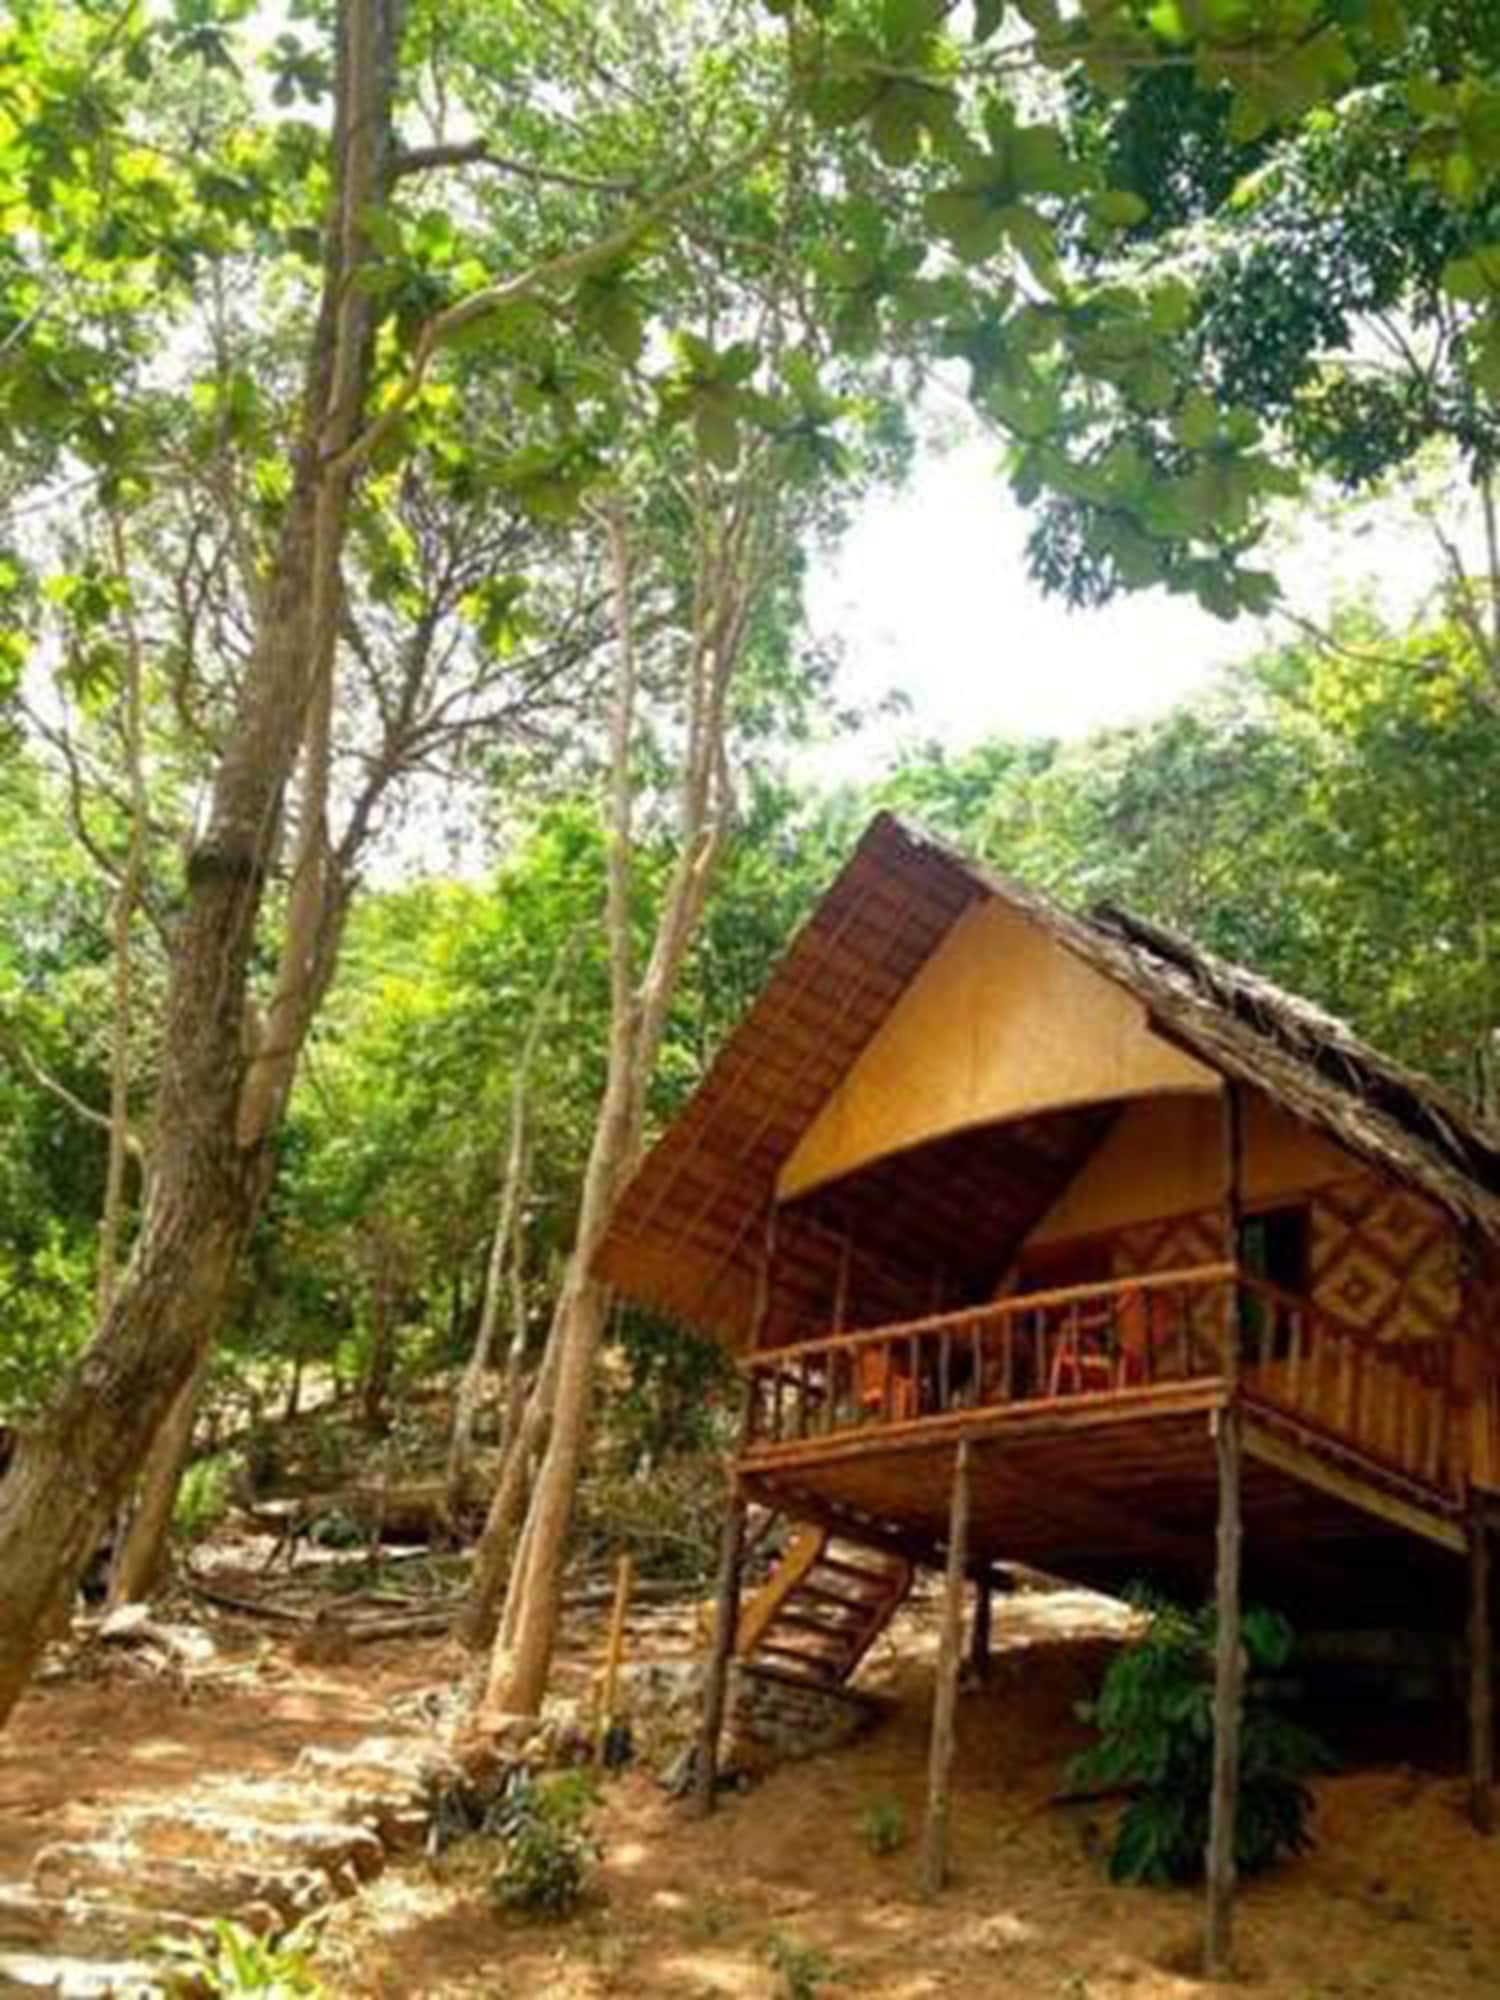 Loma Sea View Bungalow, Nua Khlong